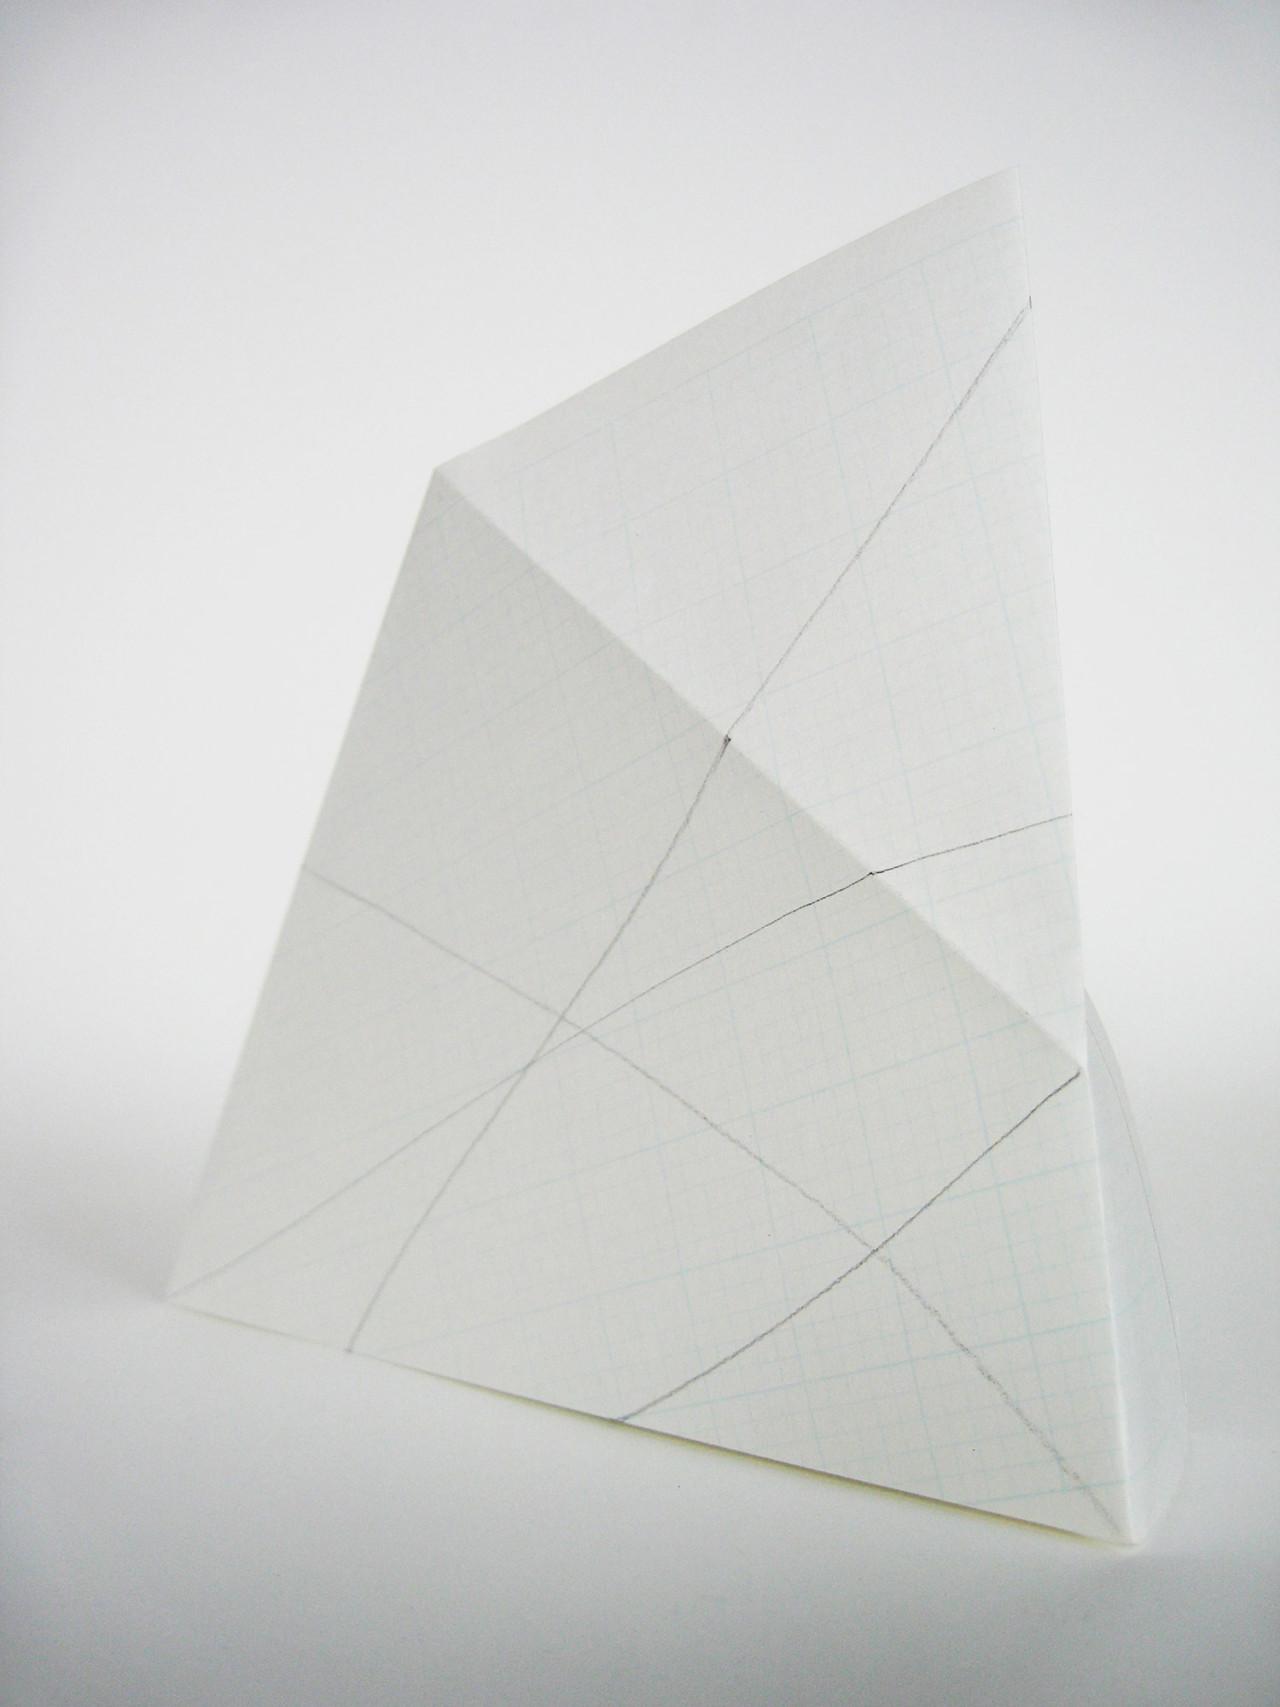 Saskia Wendland Foldings